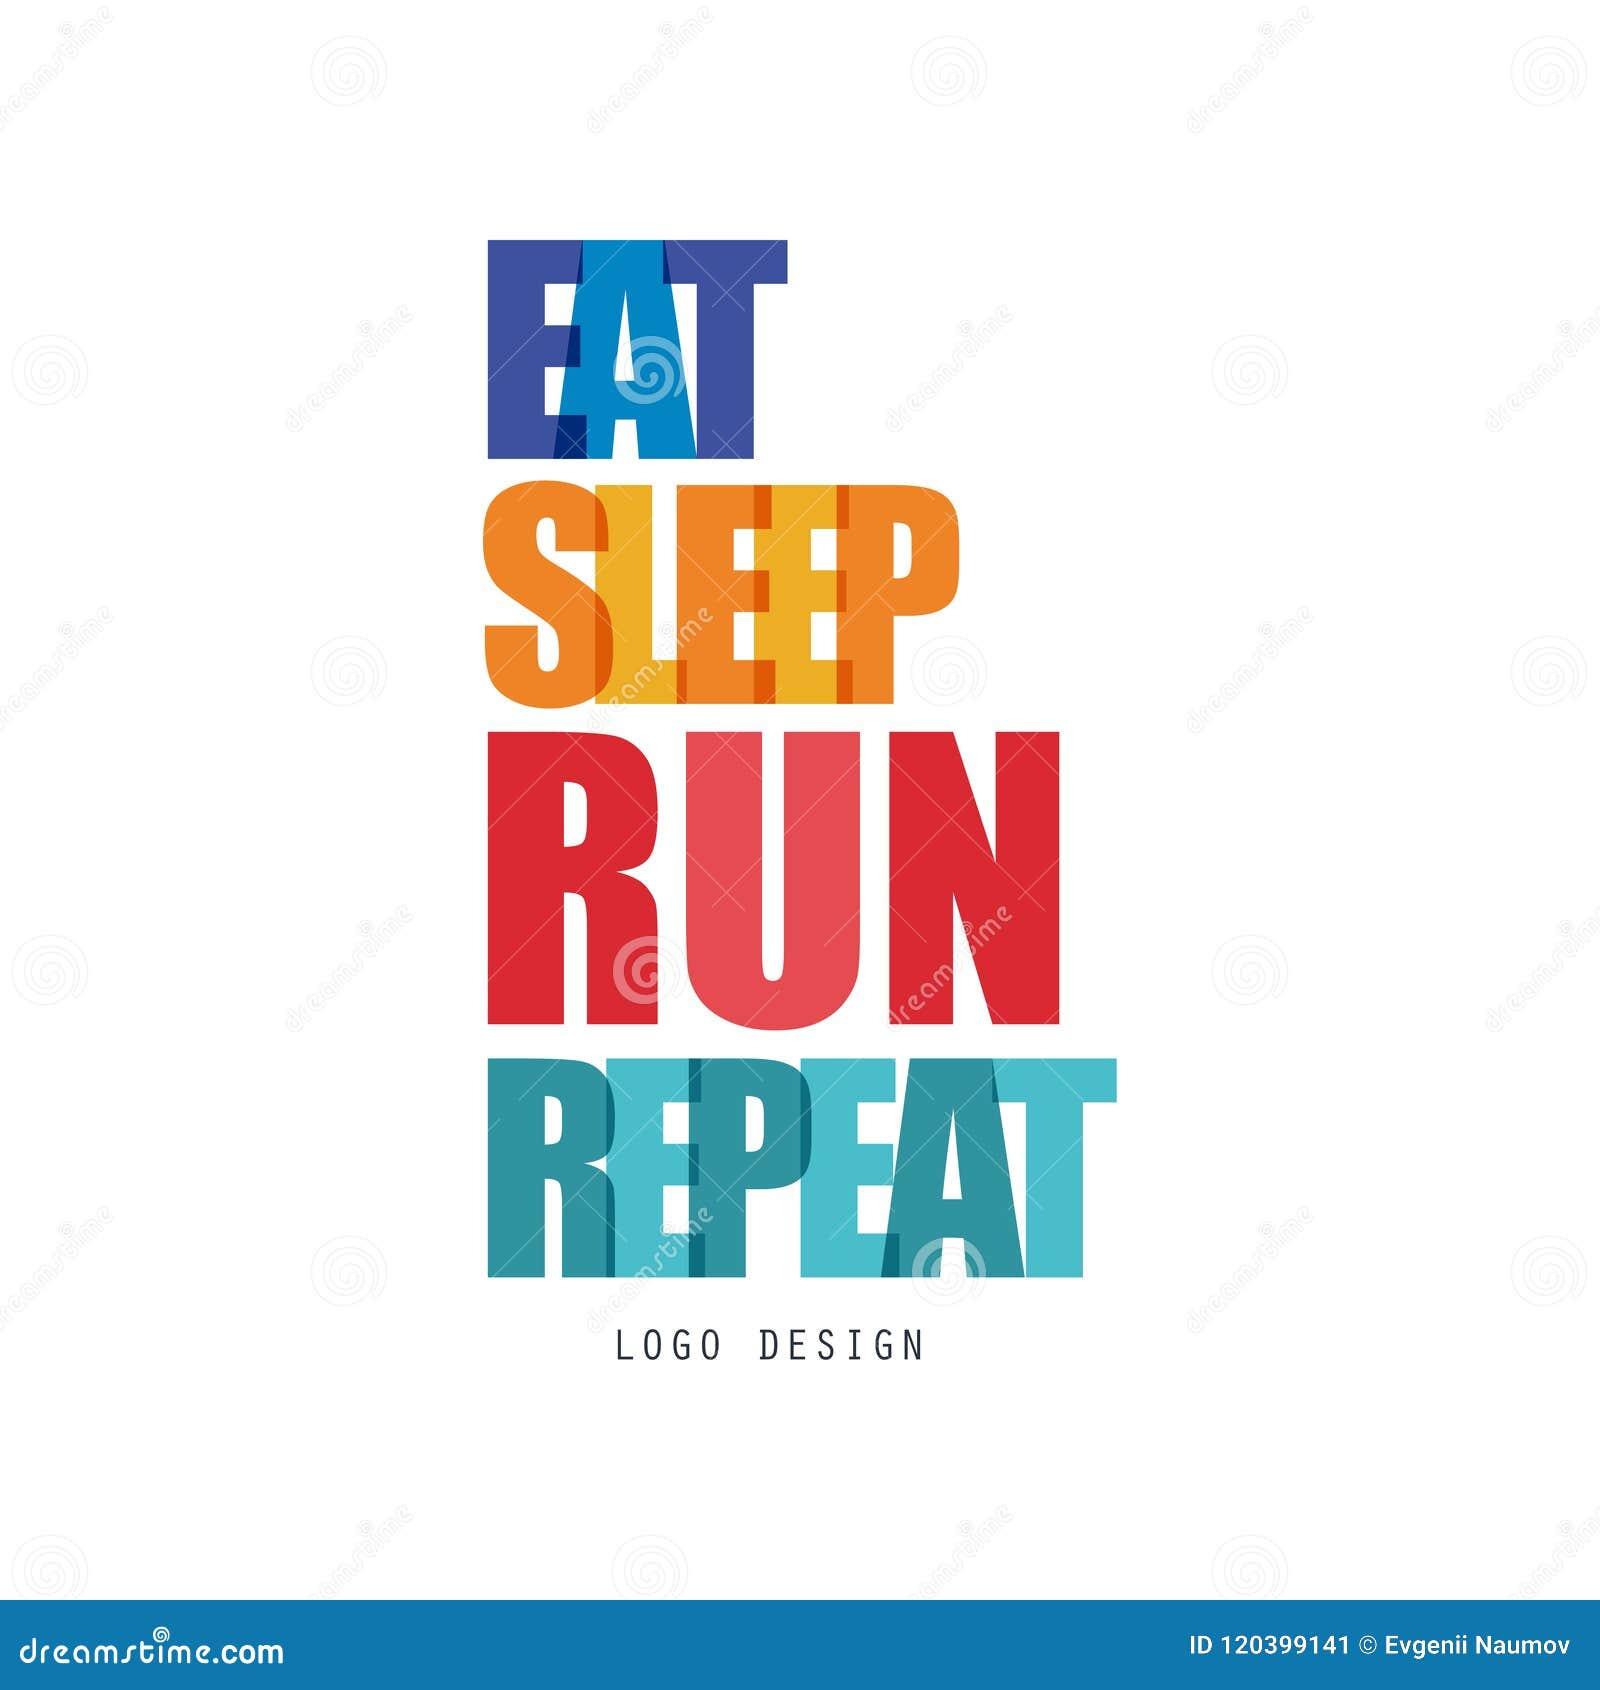 Eat, sleep, run, repeat logo design, inspirational and motivational slogan for running poster, card, decoration banner